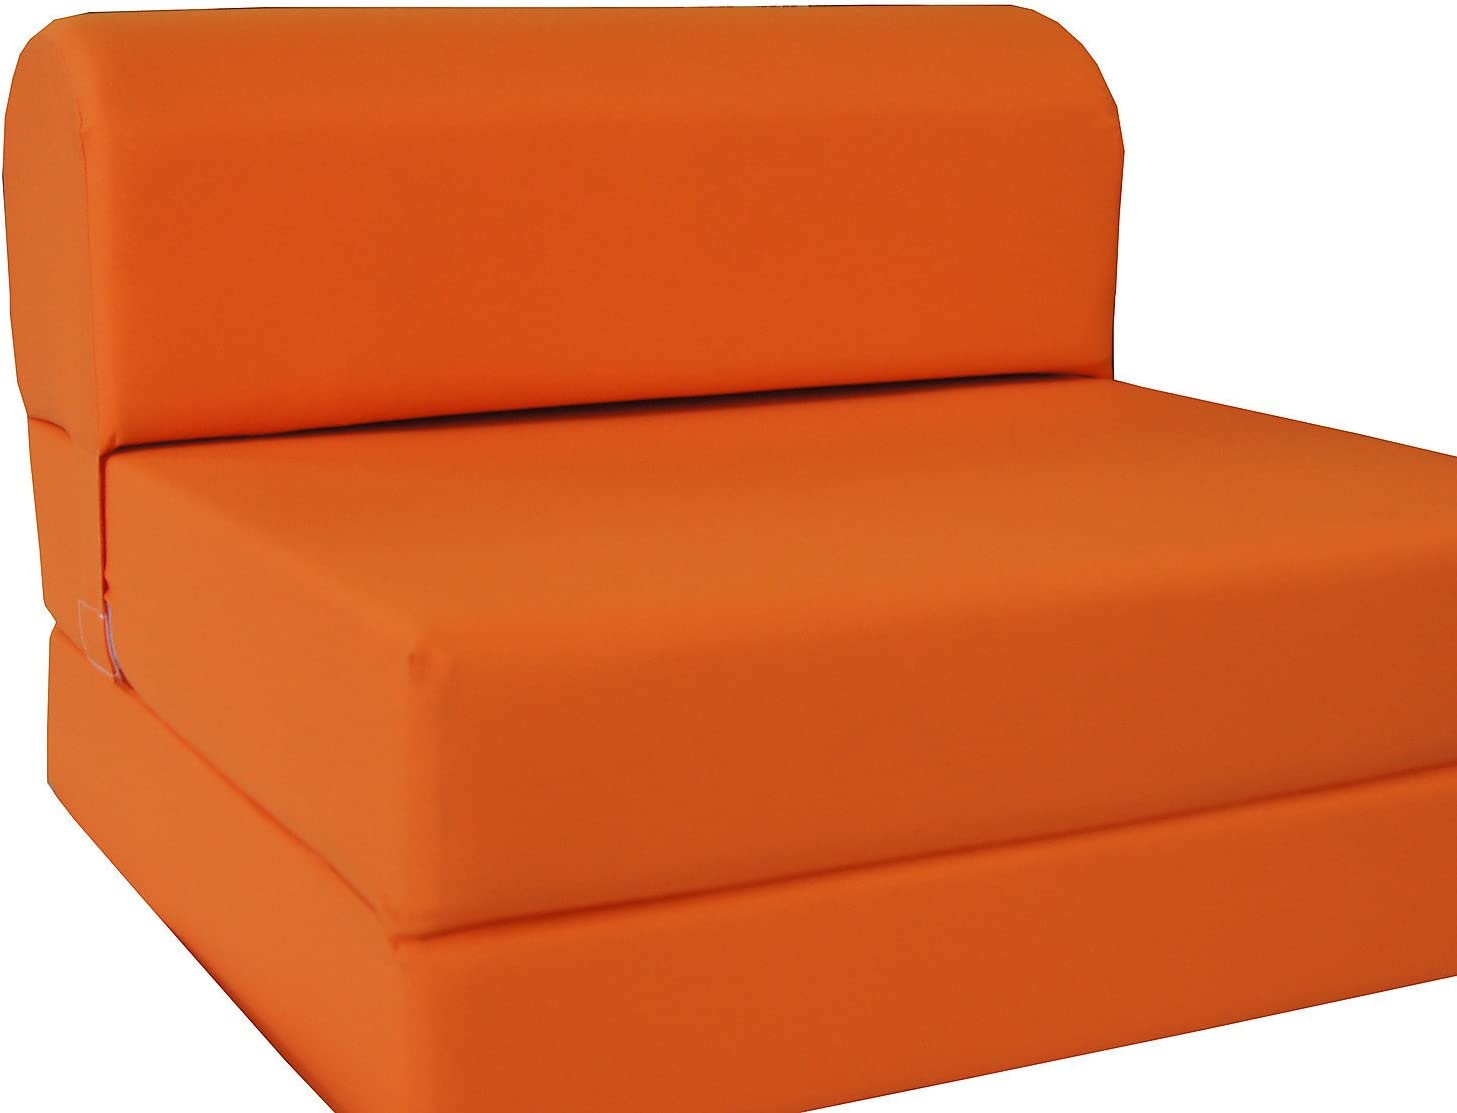 D D Futon Furniture Orange Sleeper Chair Folding Foam Bed Sized 6 X 32 X 70, Studio Guest Foldable Chair Beds, Foam Sofa, Couch, High Density Foam 1.8 lbs